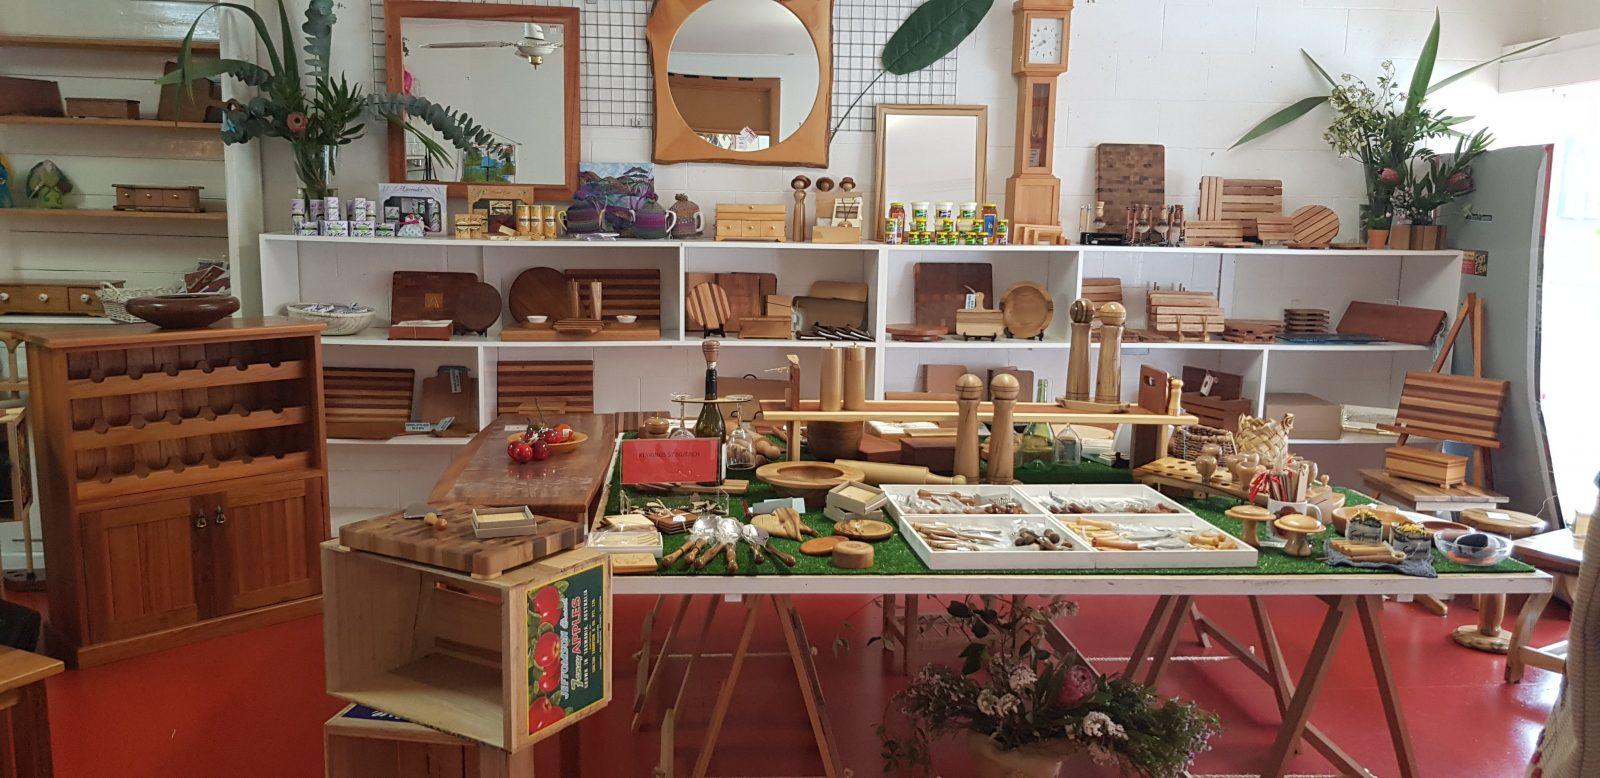 Tasmanian woodcraft exclusive to makers on church st Geeveston Tasmania